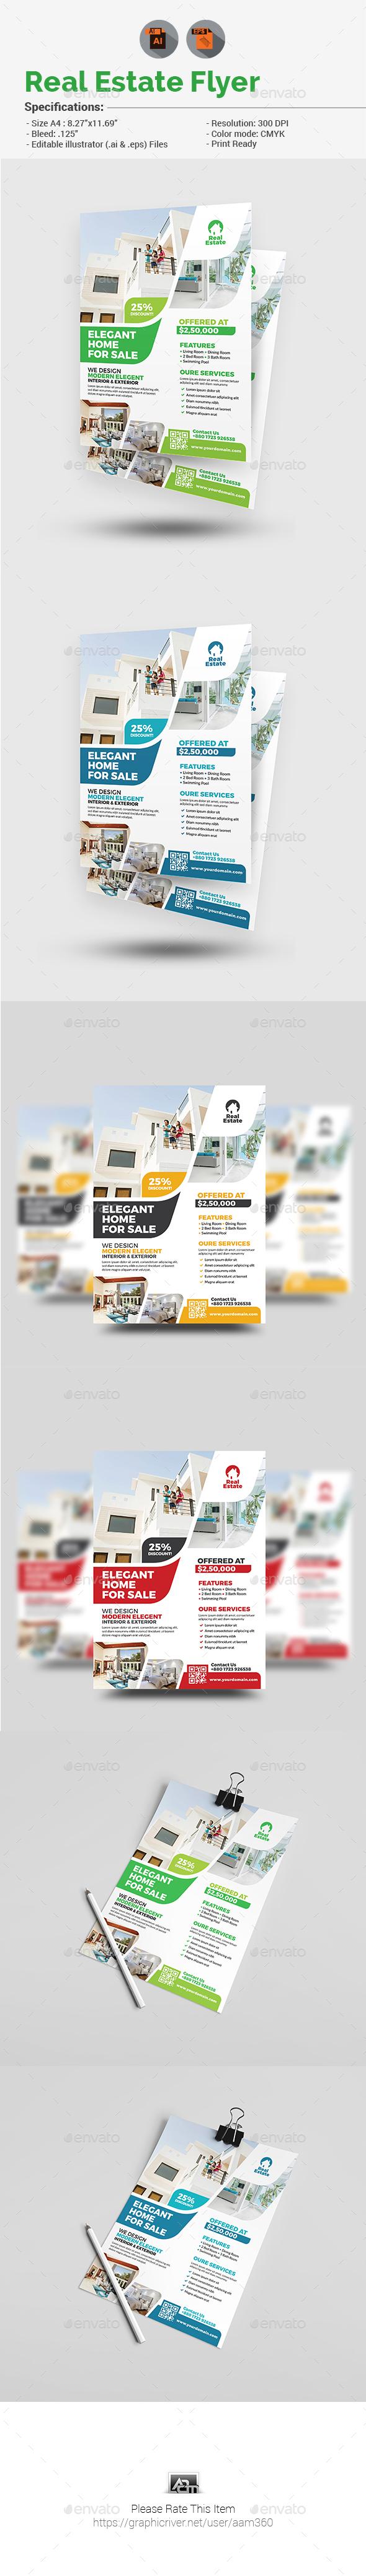 Real Estate Flyer V3 - Corporate Flyers